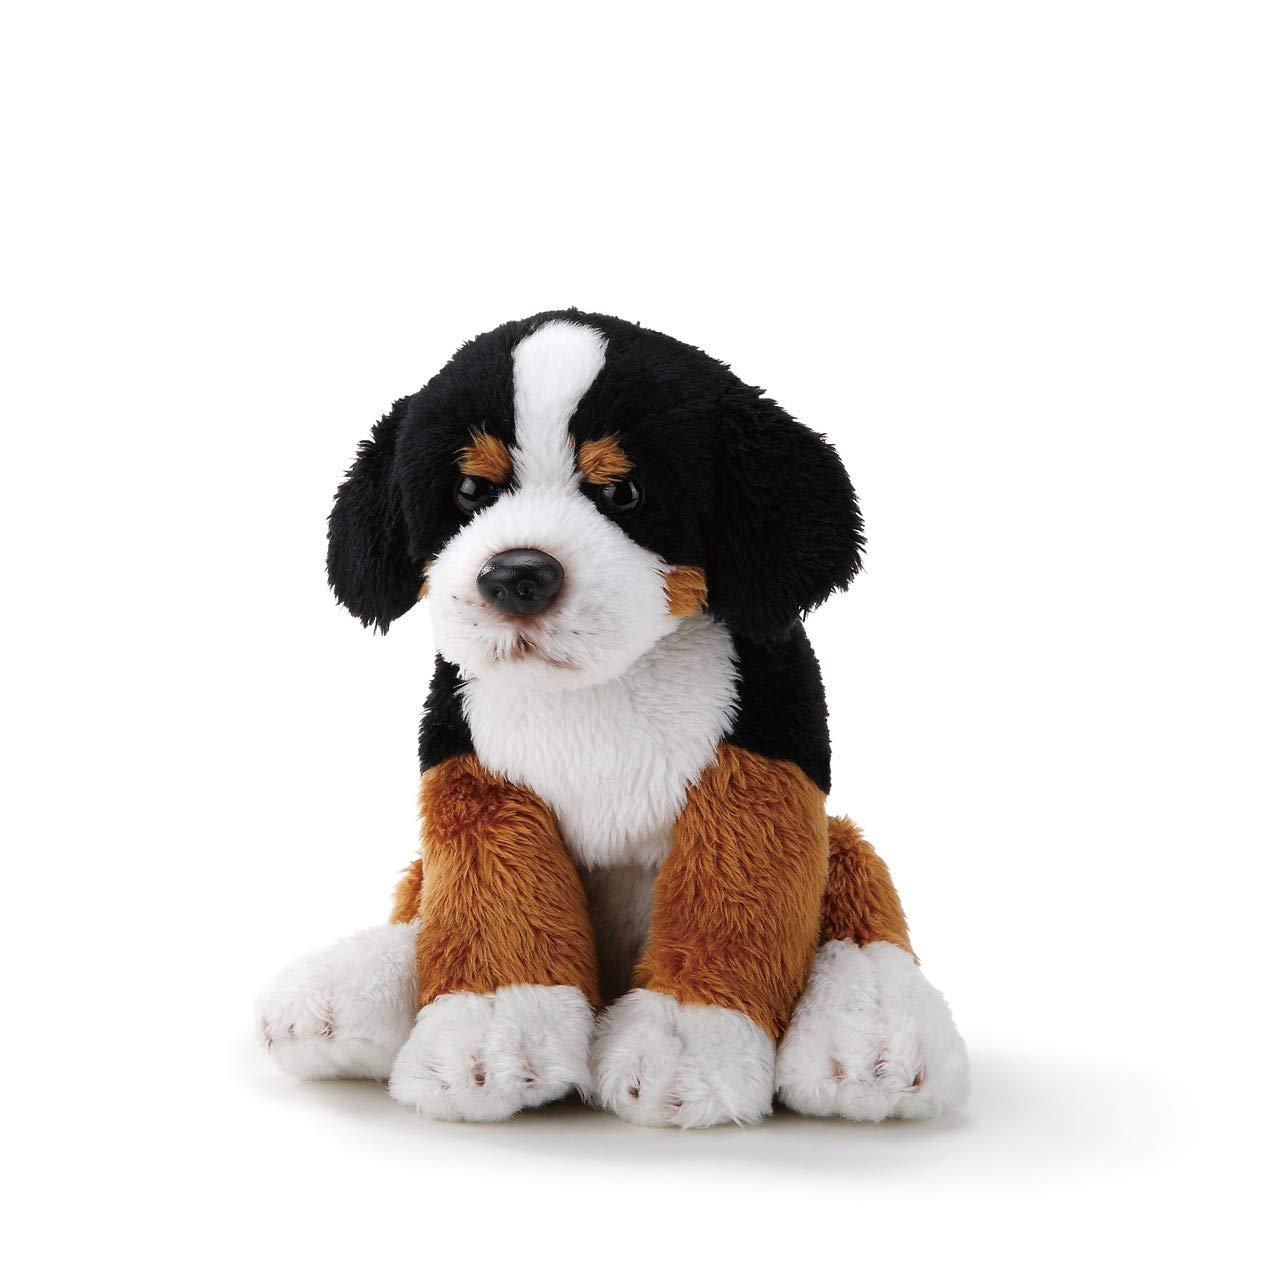 DEMDACO Bernese Mountain Dog Children's Plush Beanbag Stuffed Animal Toy